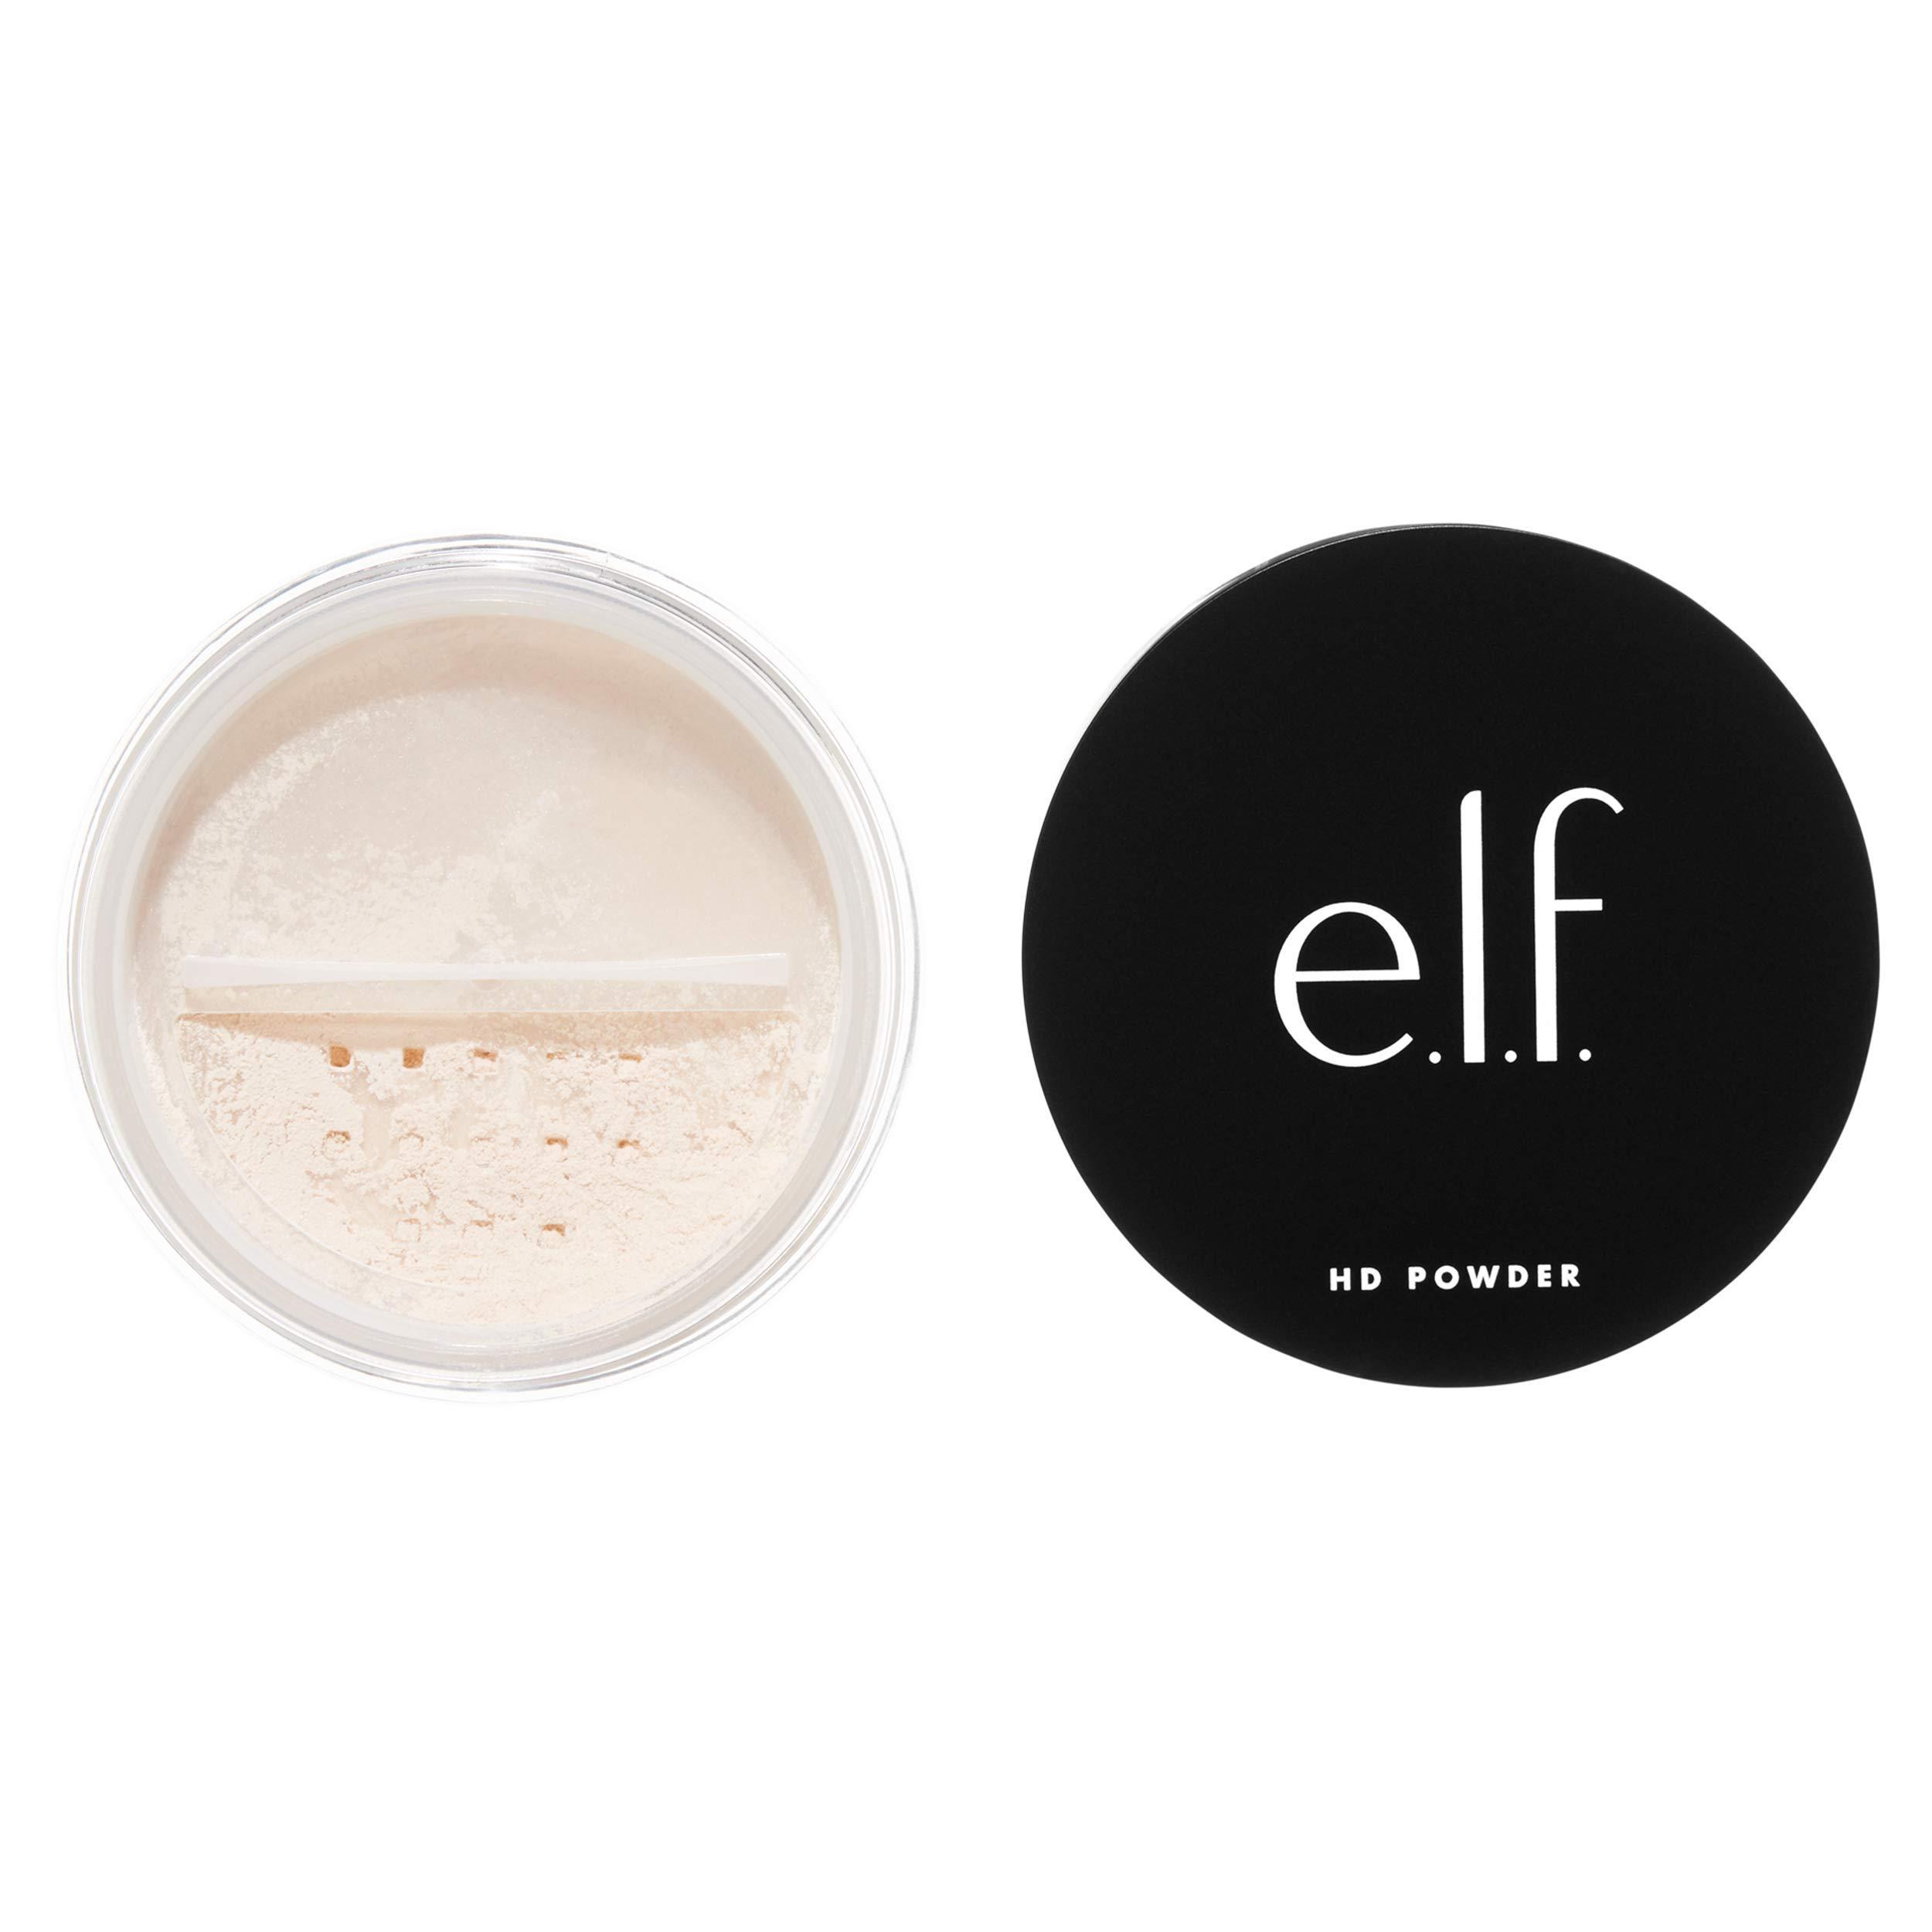 e.l.f.   High Definition Loose Face Powder, Soft Luminance, 0.28 Ounce